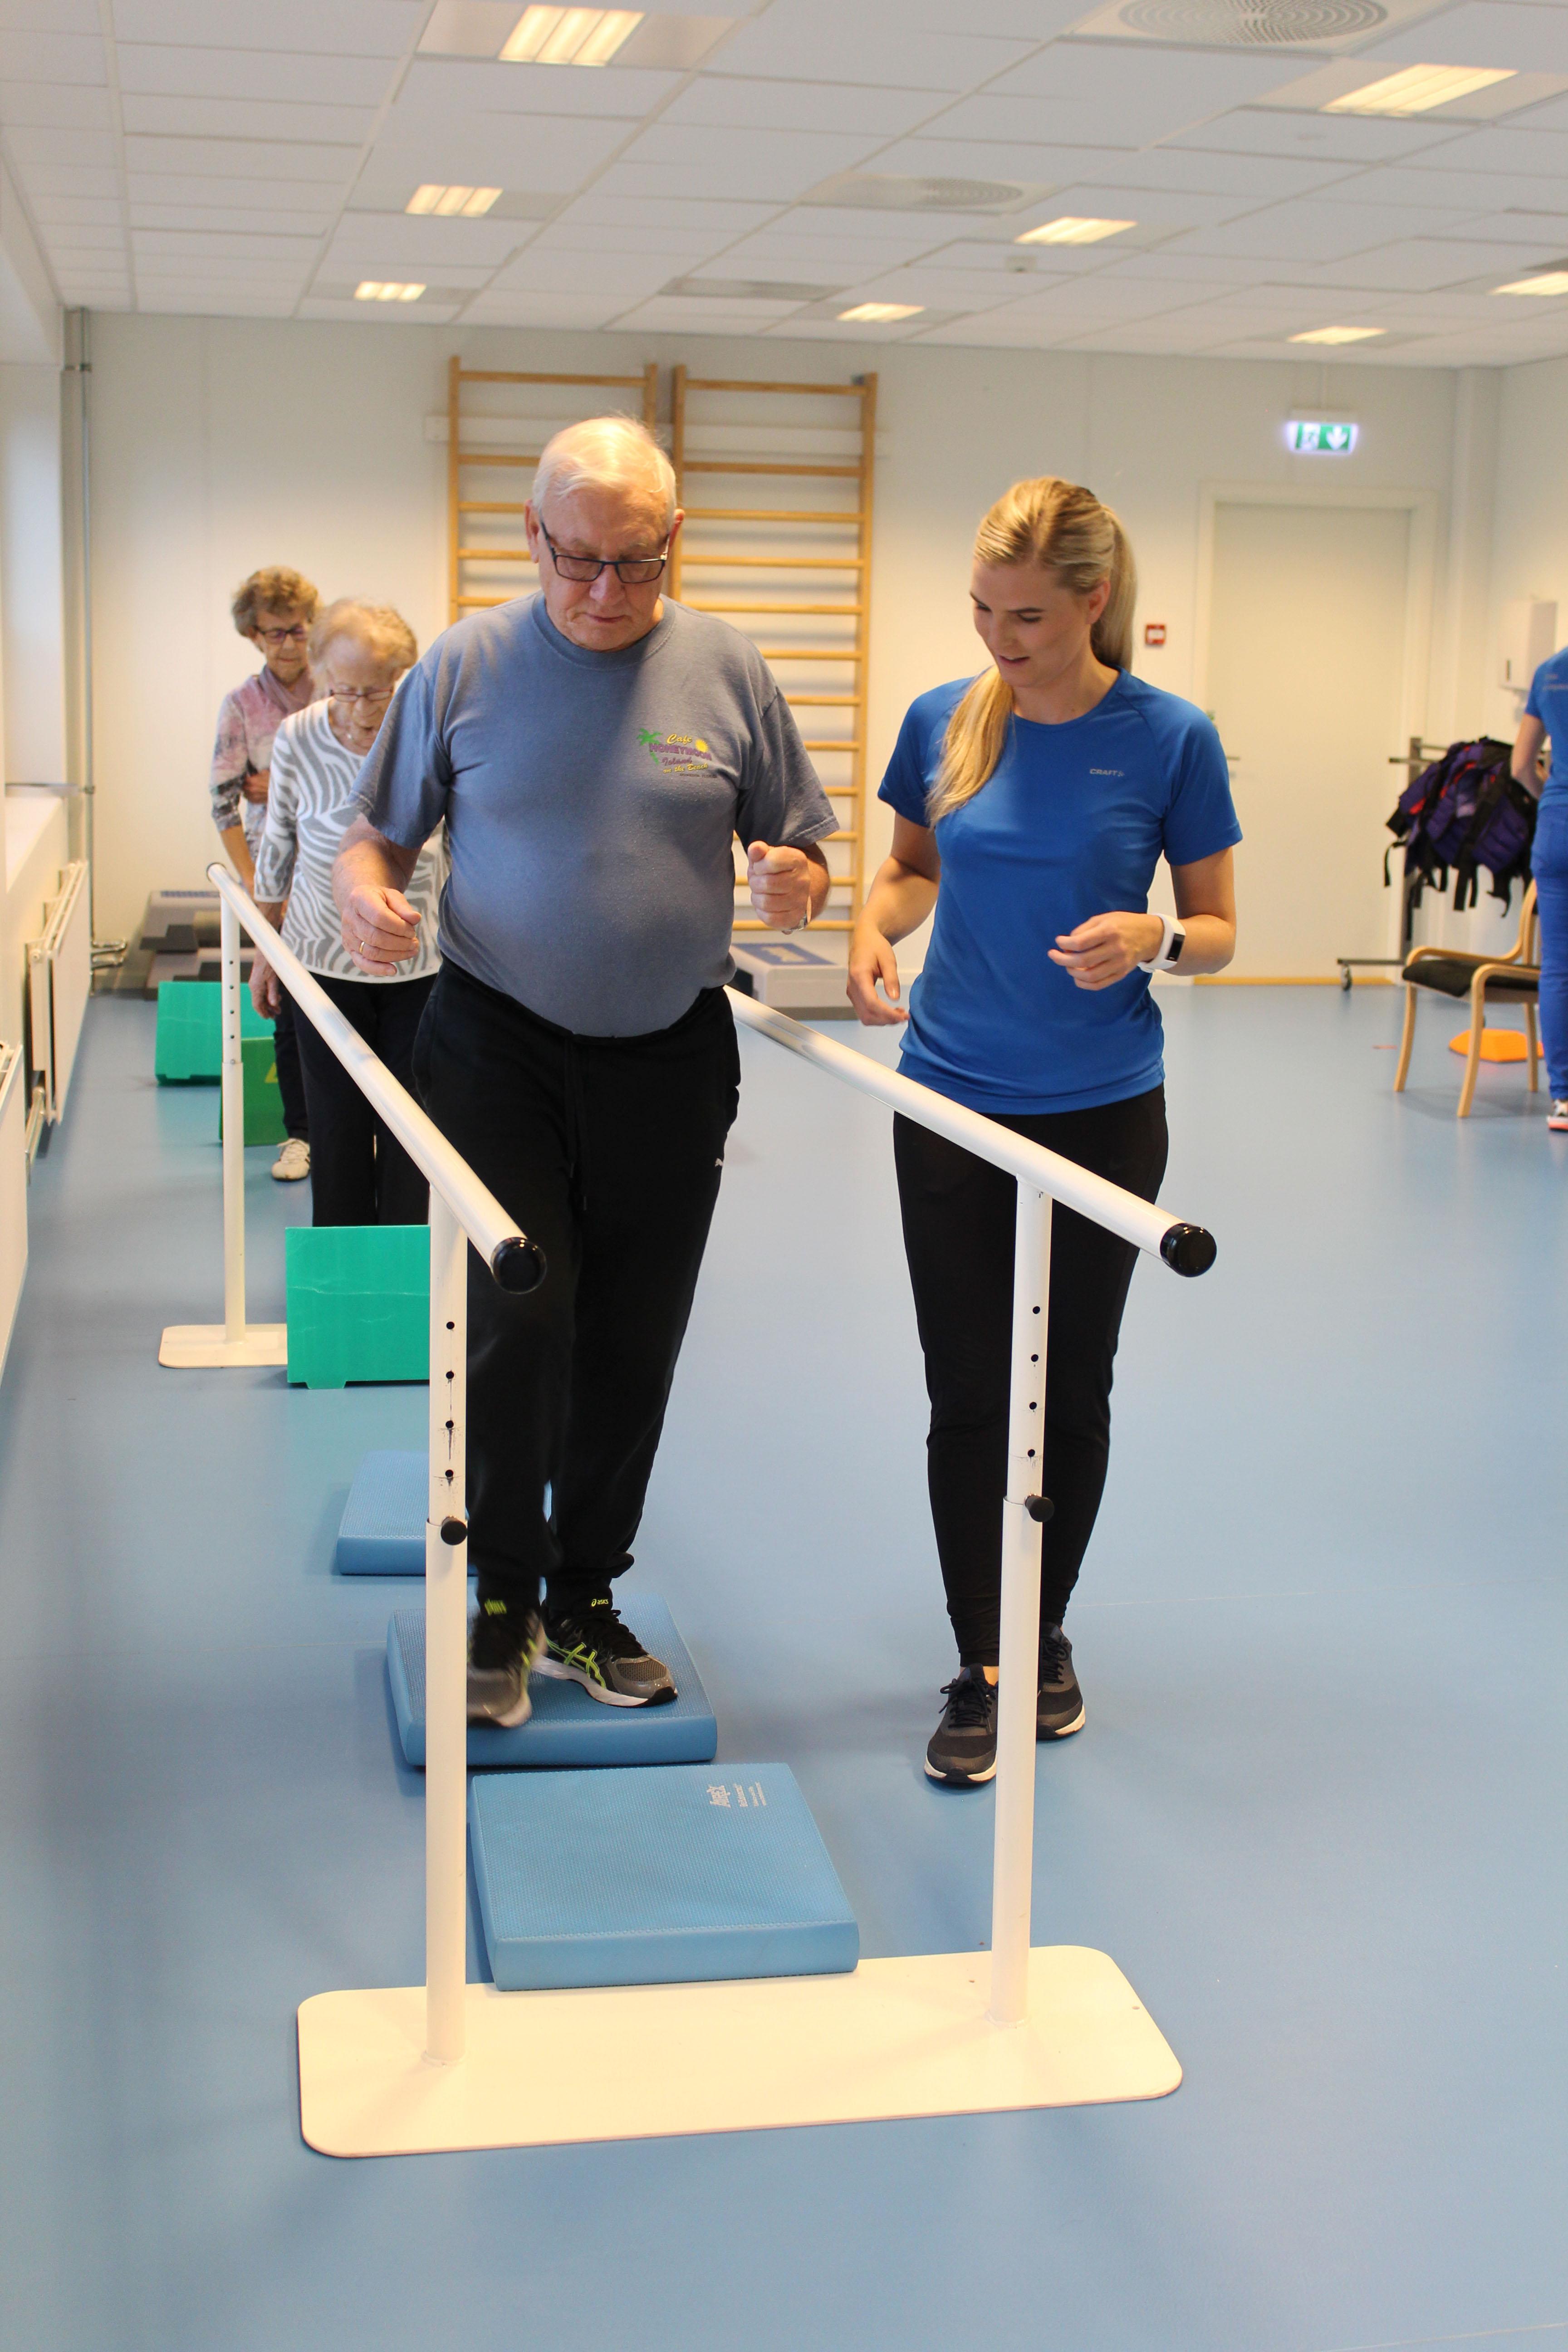 stavanger fysioterapi & trening